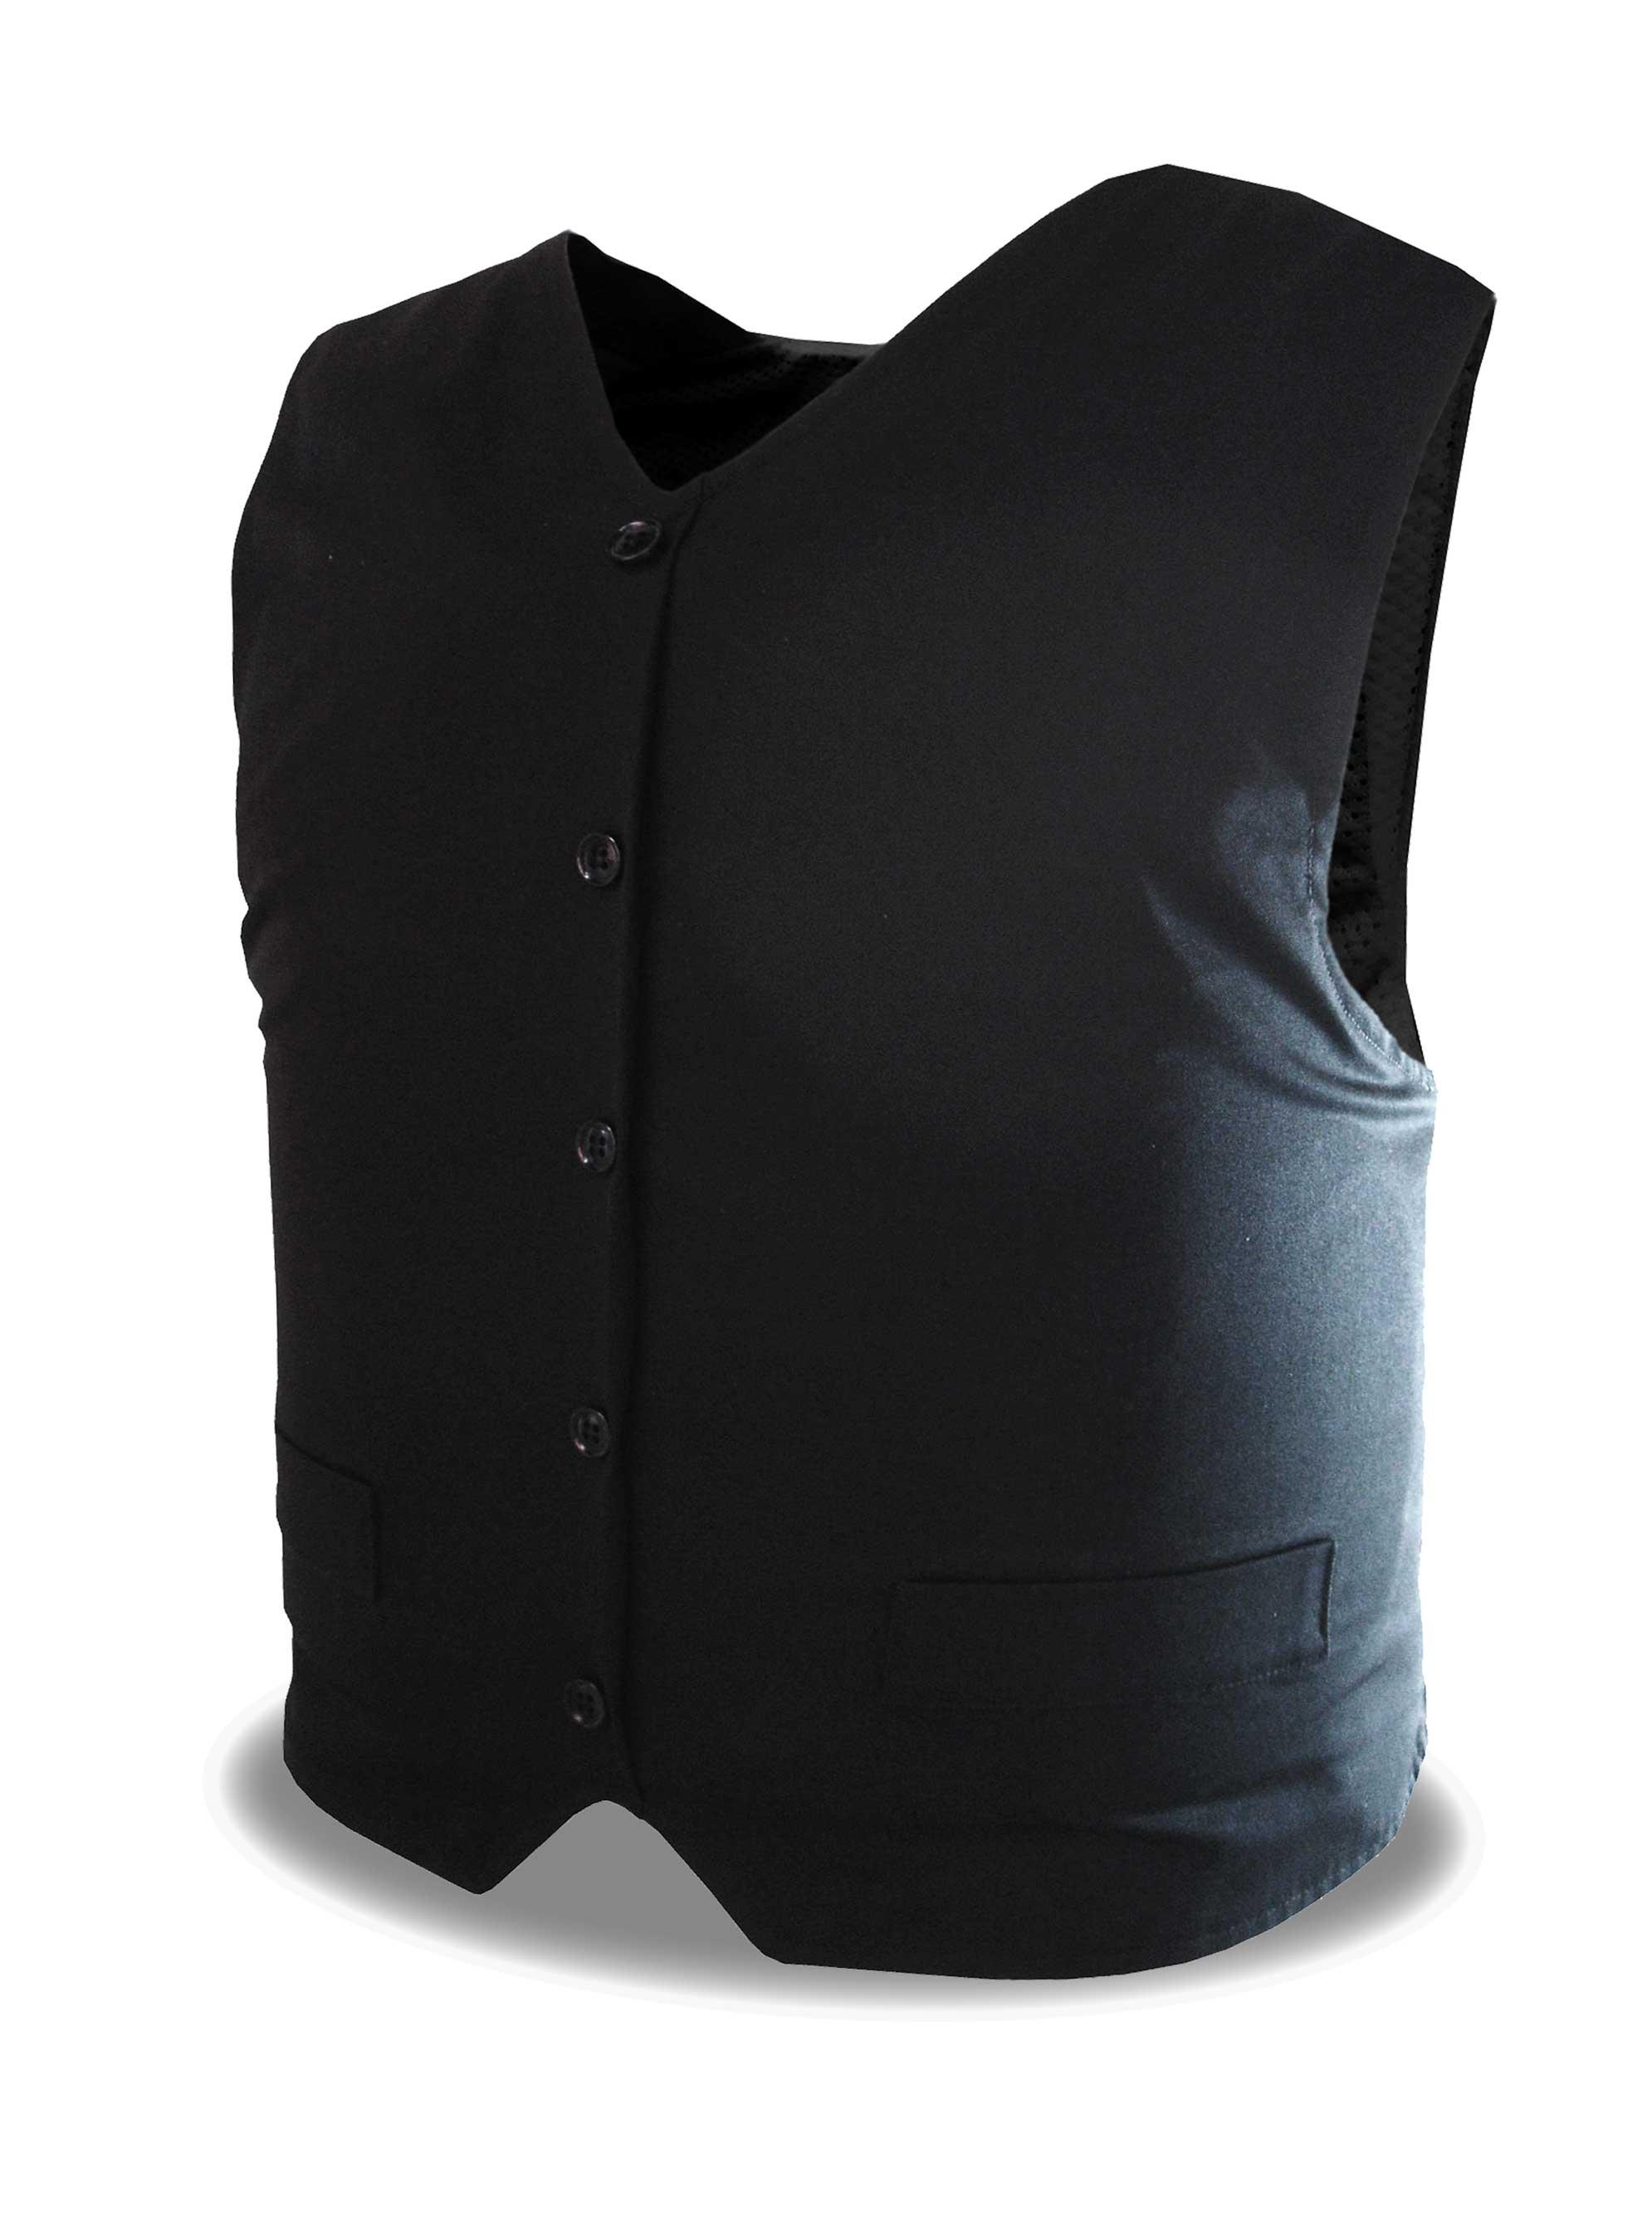 Vestguard Executive Waistcoat Covert Concealable Ballistic